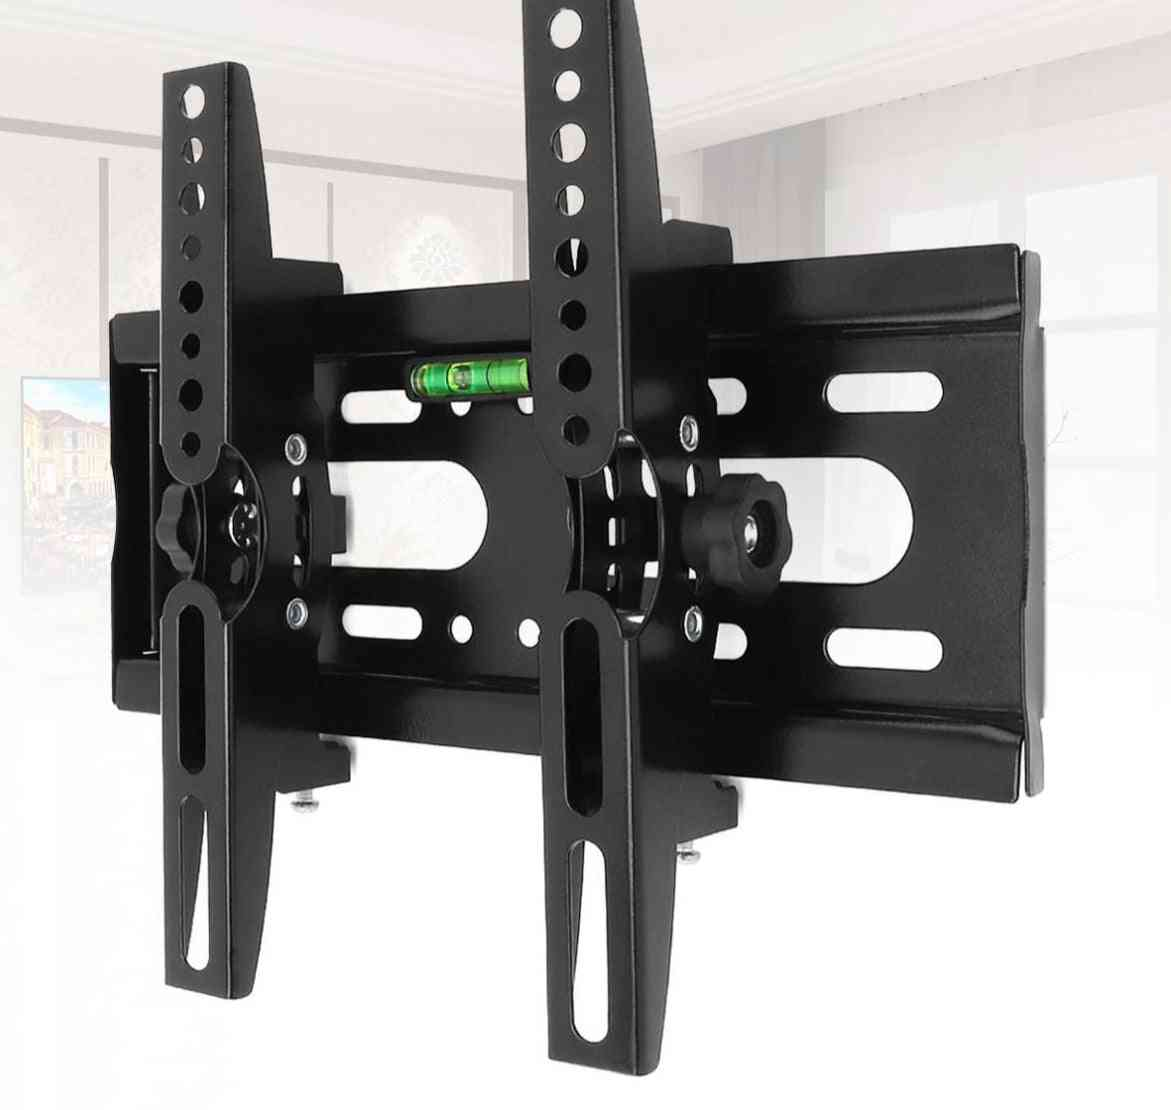 Universal 25kg Adjustable Tv Wall  Mount Bracket Flat Panel Tv